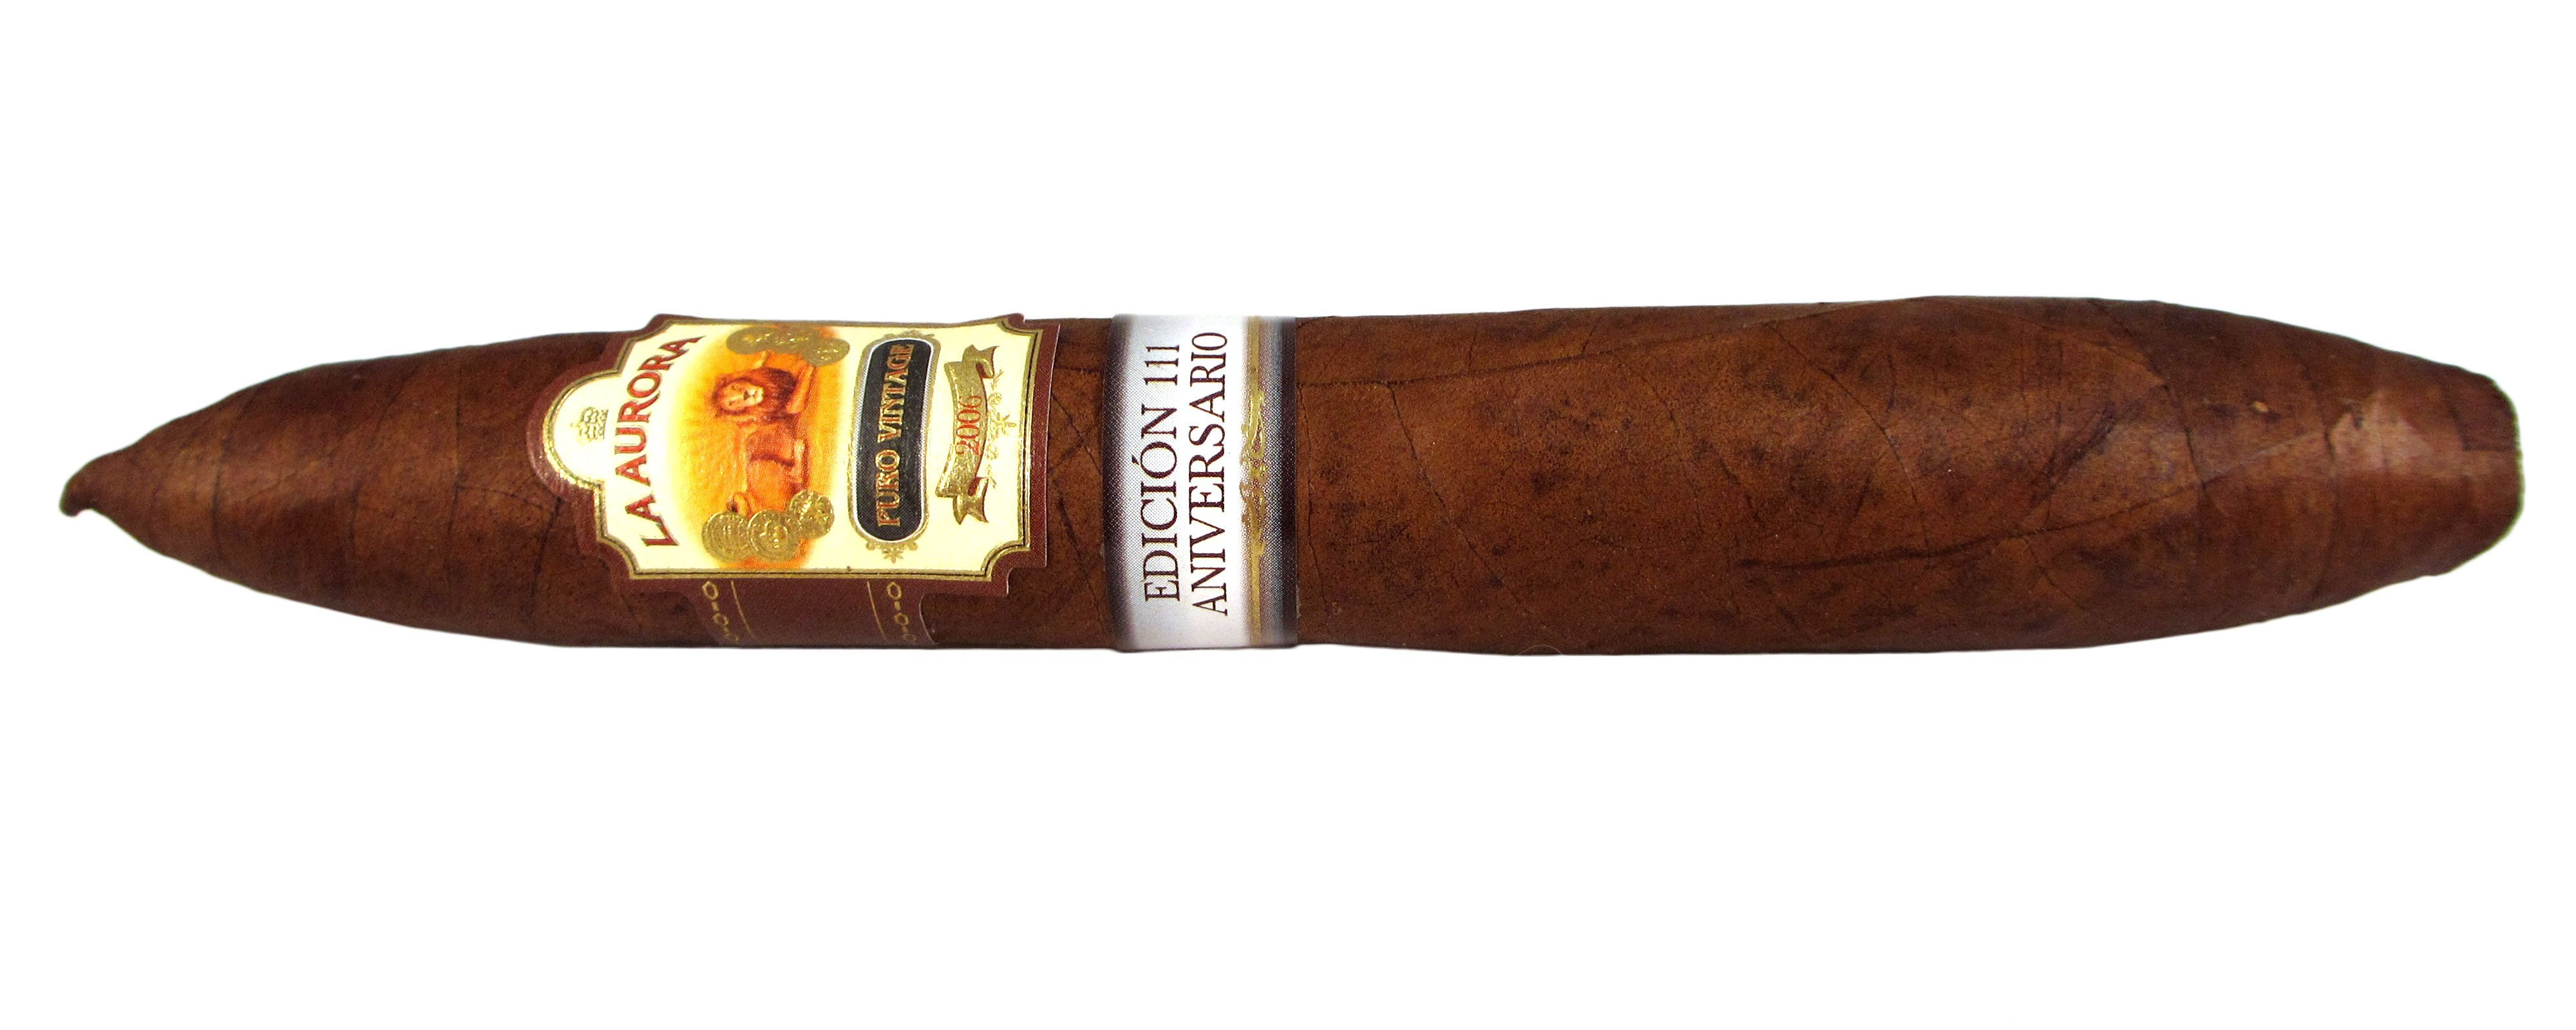 Blind Cigar Review: La Aurora | Puro Vintage 2006